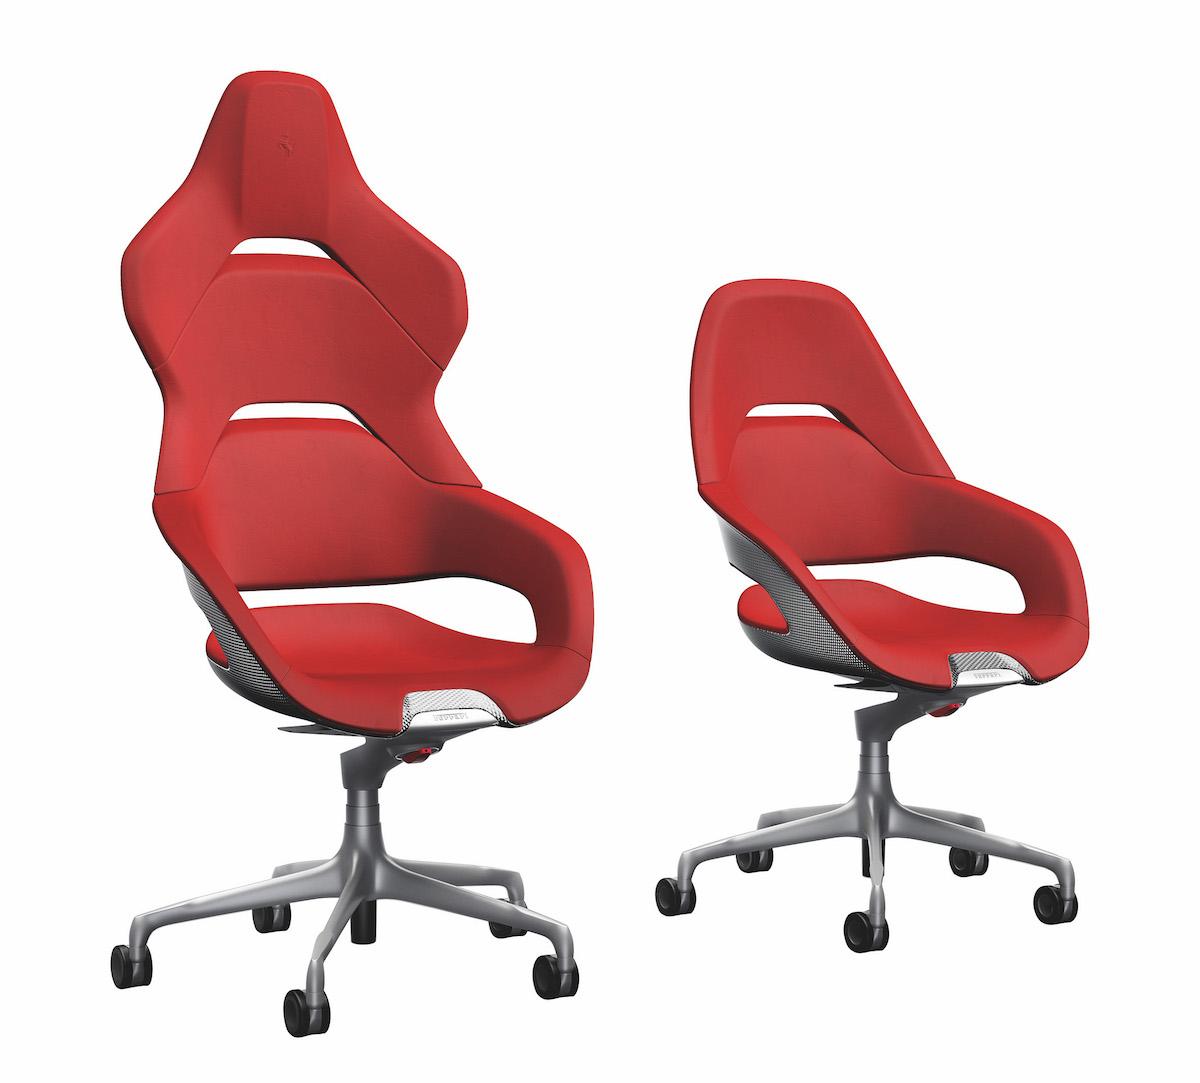 Ferrari And Poltrona Frau Present The New Office Chair Proudmag Com